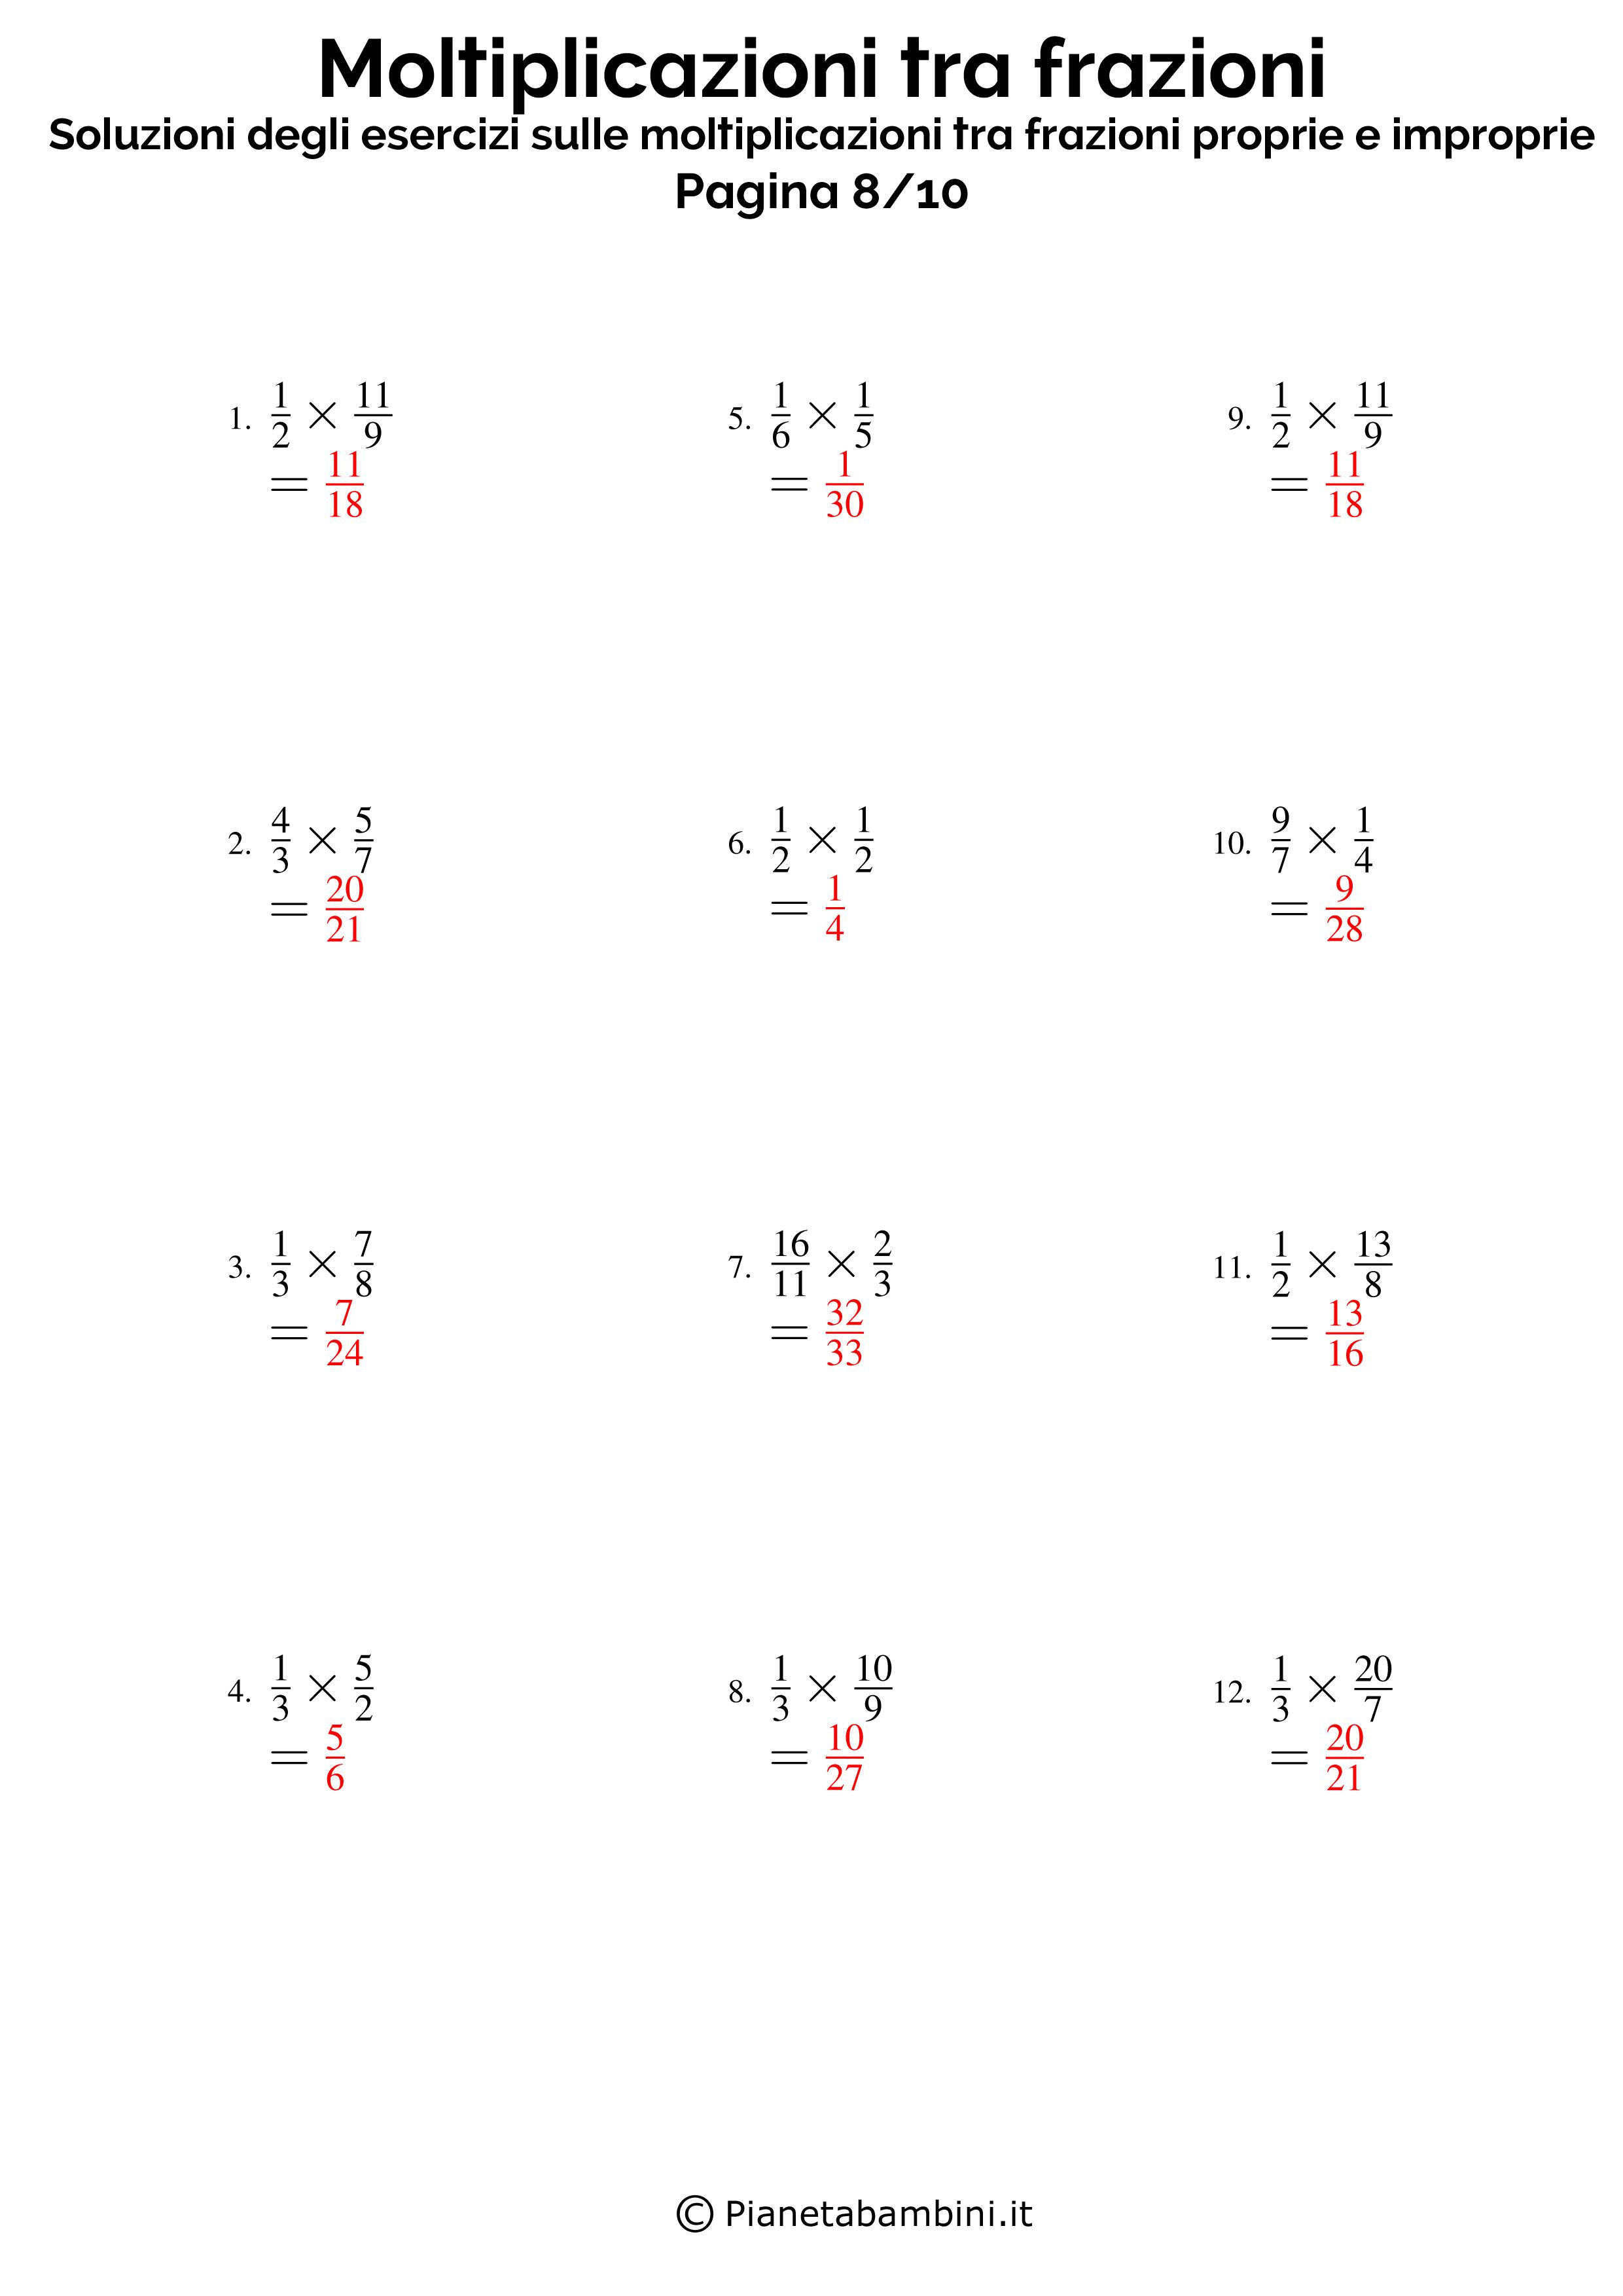 Soluzioni-Moltiplicazioni-Frazioni-Proprie-Improprie_08